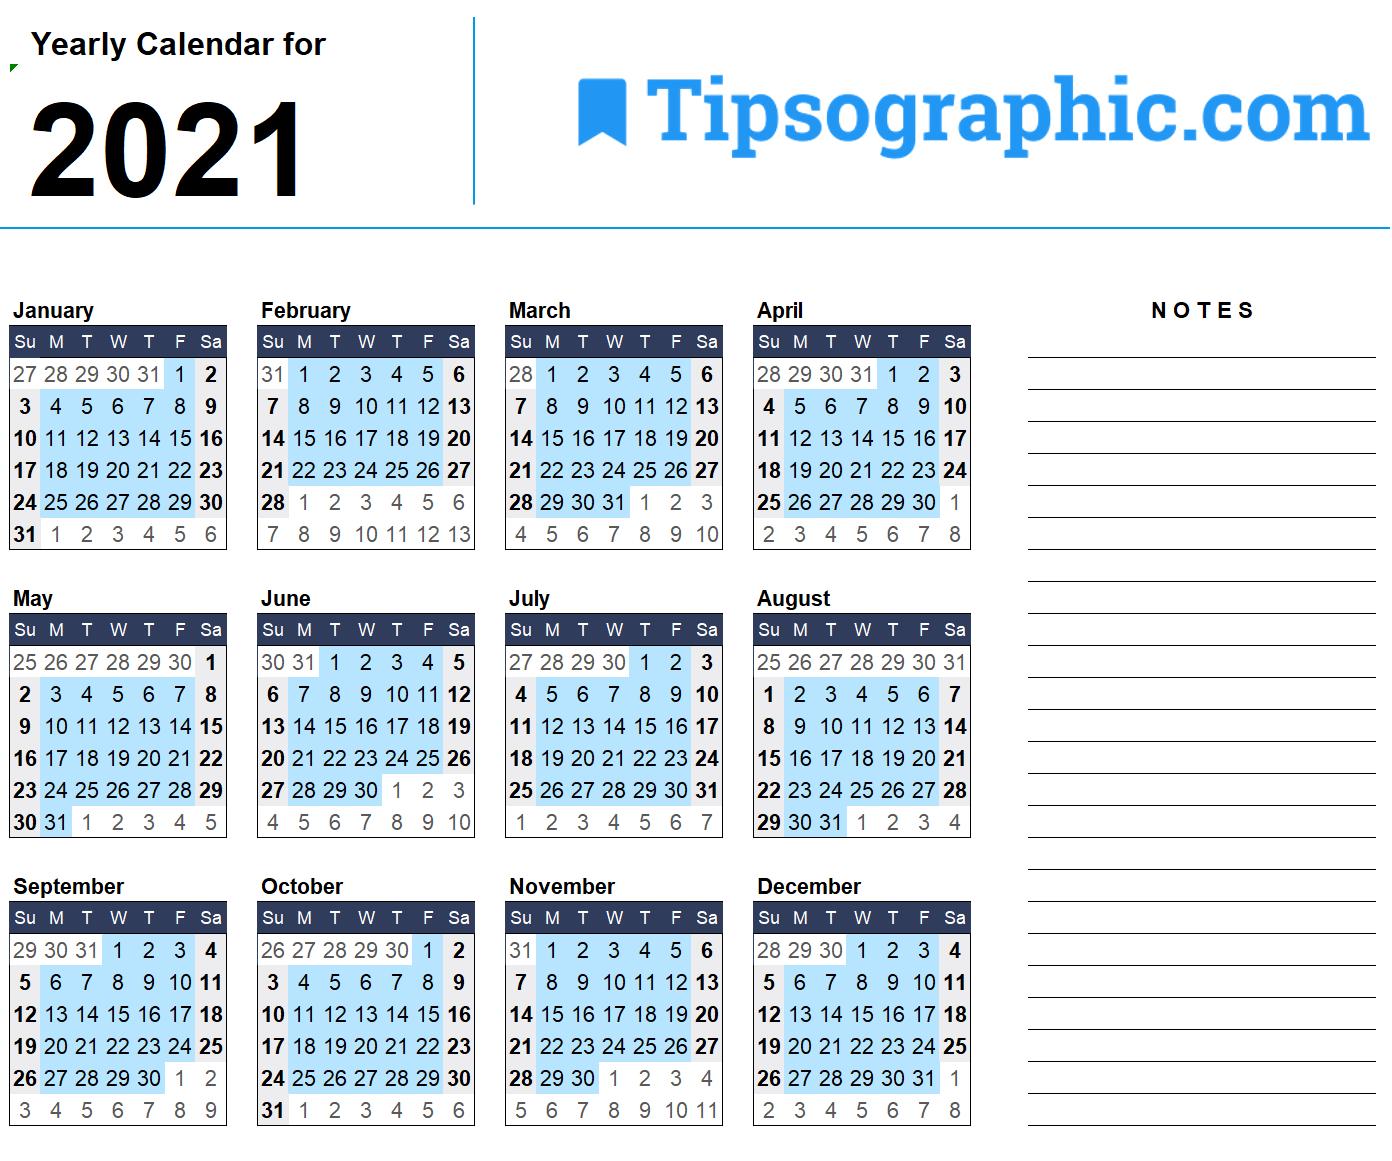 2021 Calendar Templates & Images